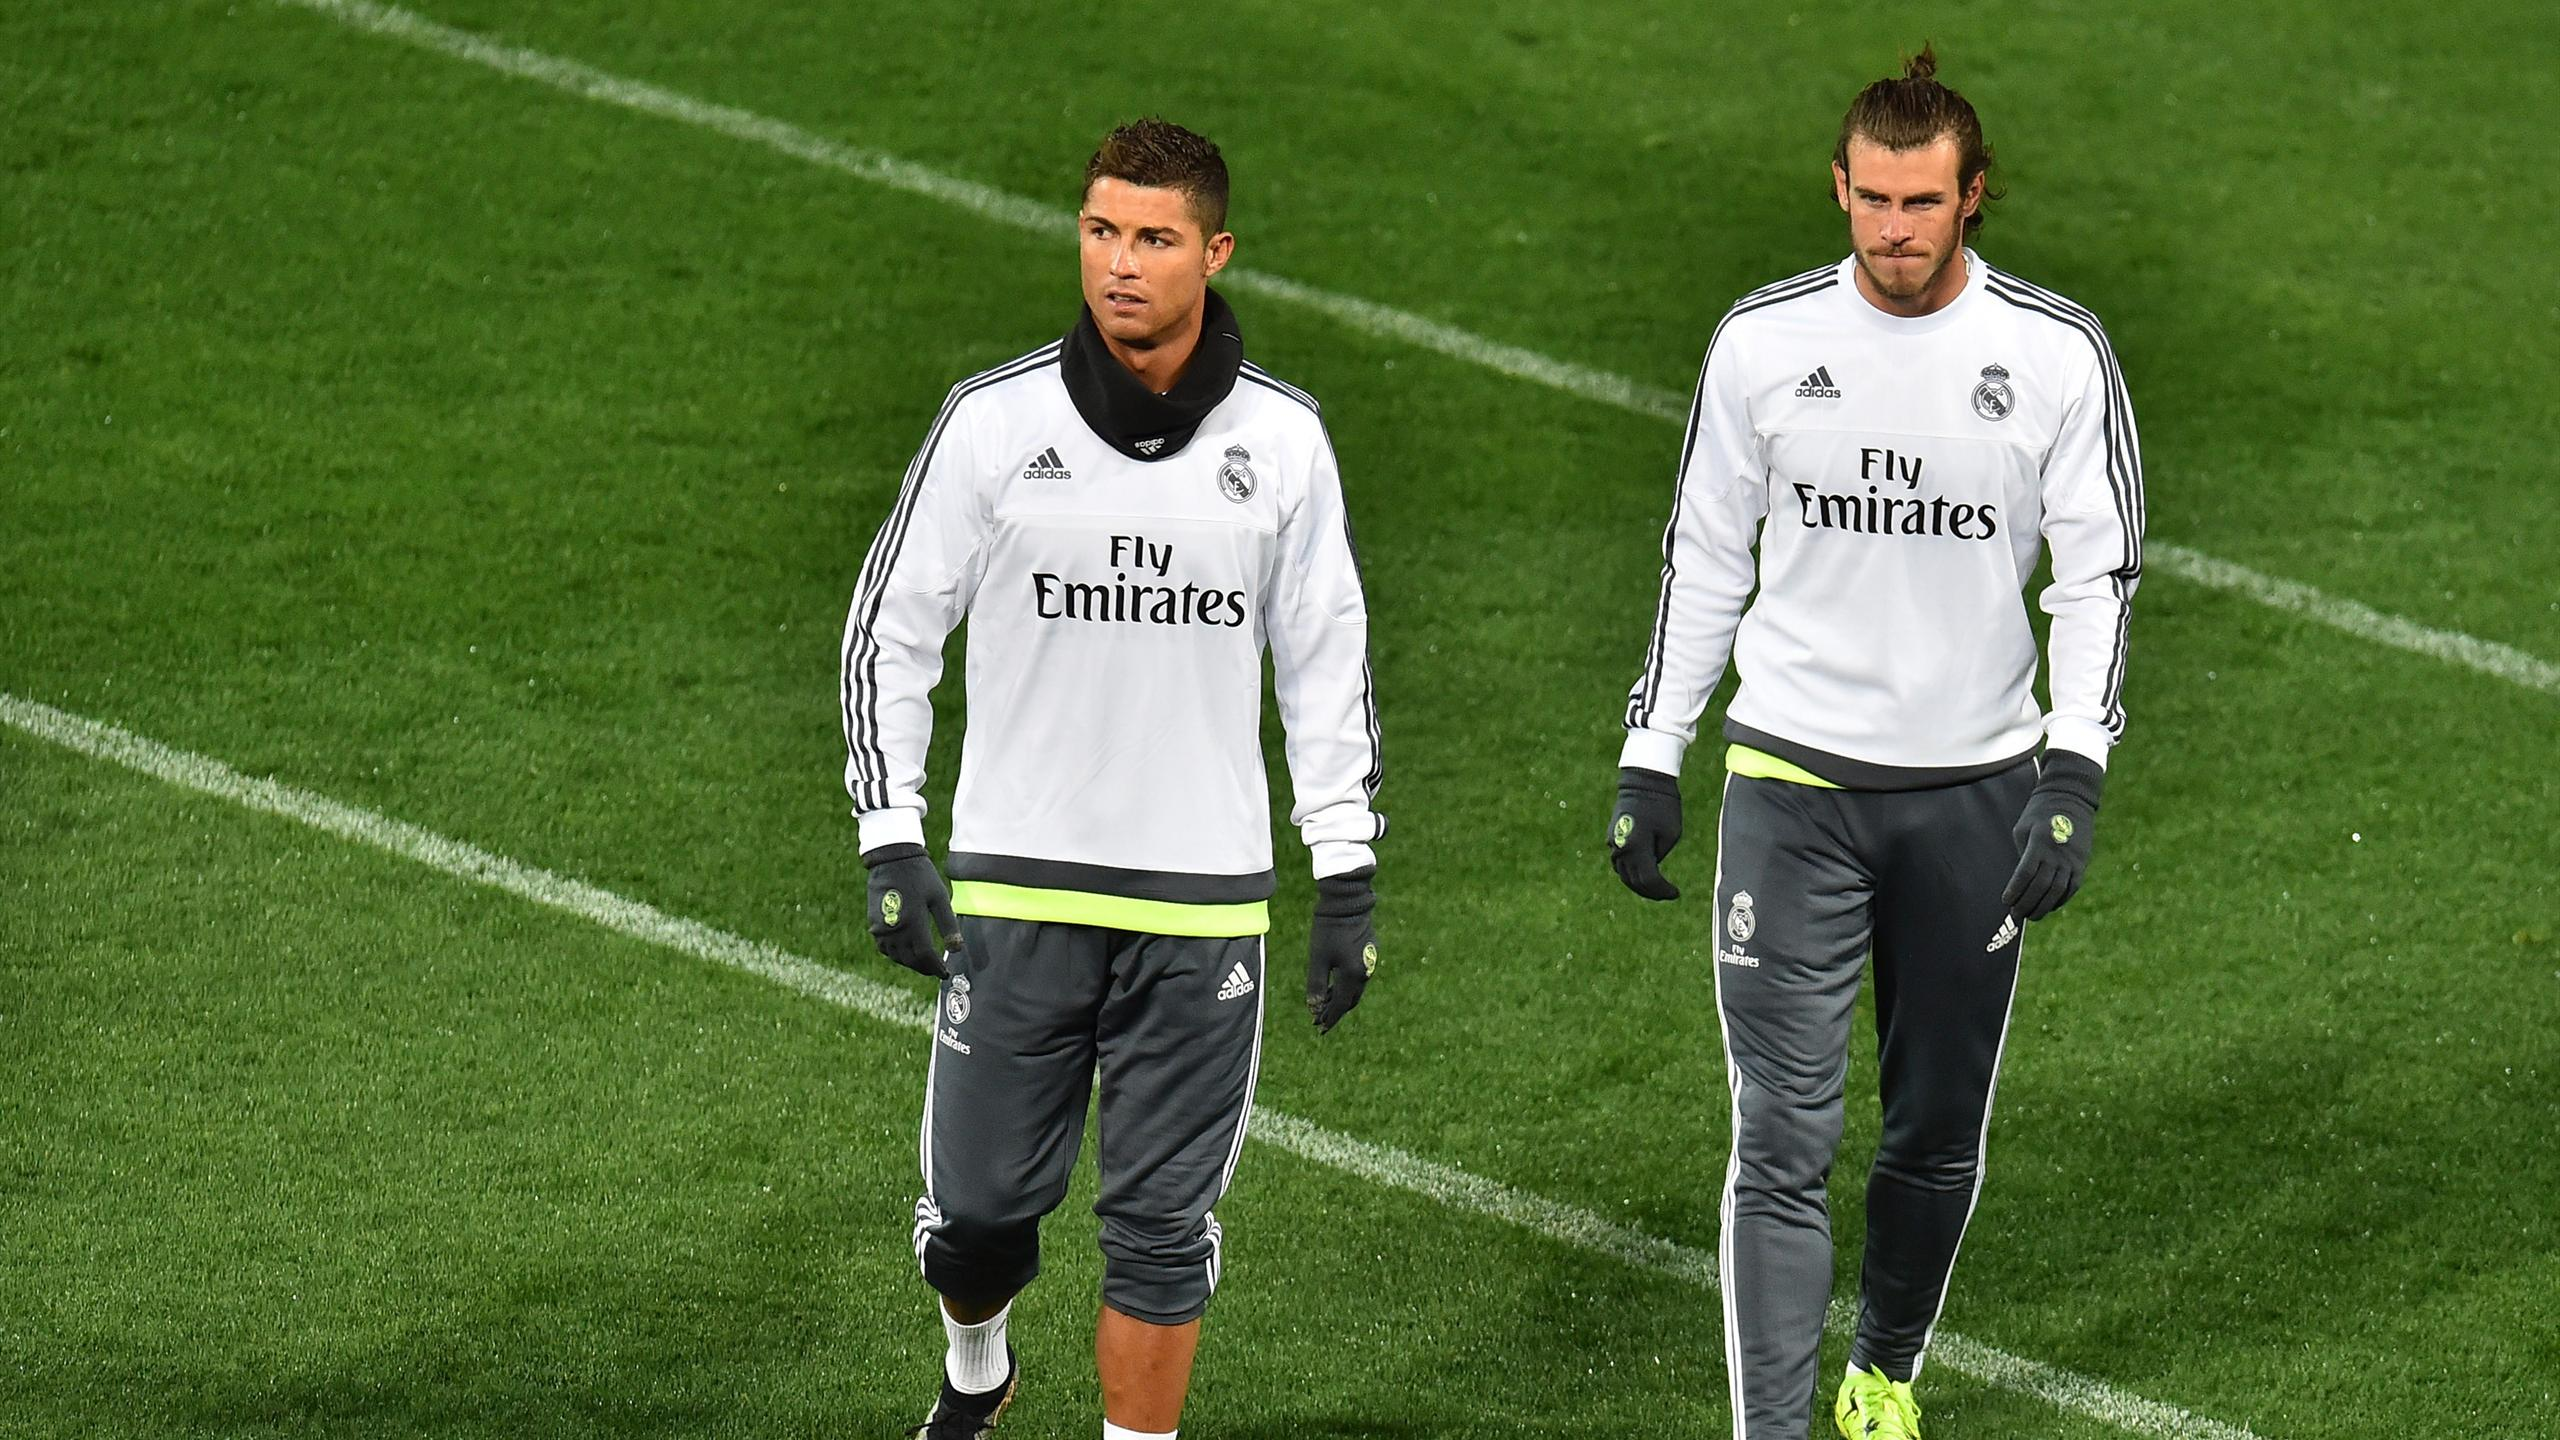 Real Madrid - Cristiano Ronaldo - Gareth Bale